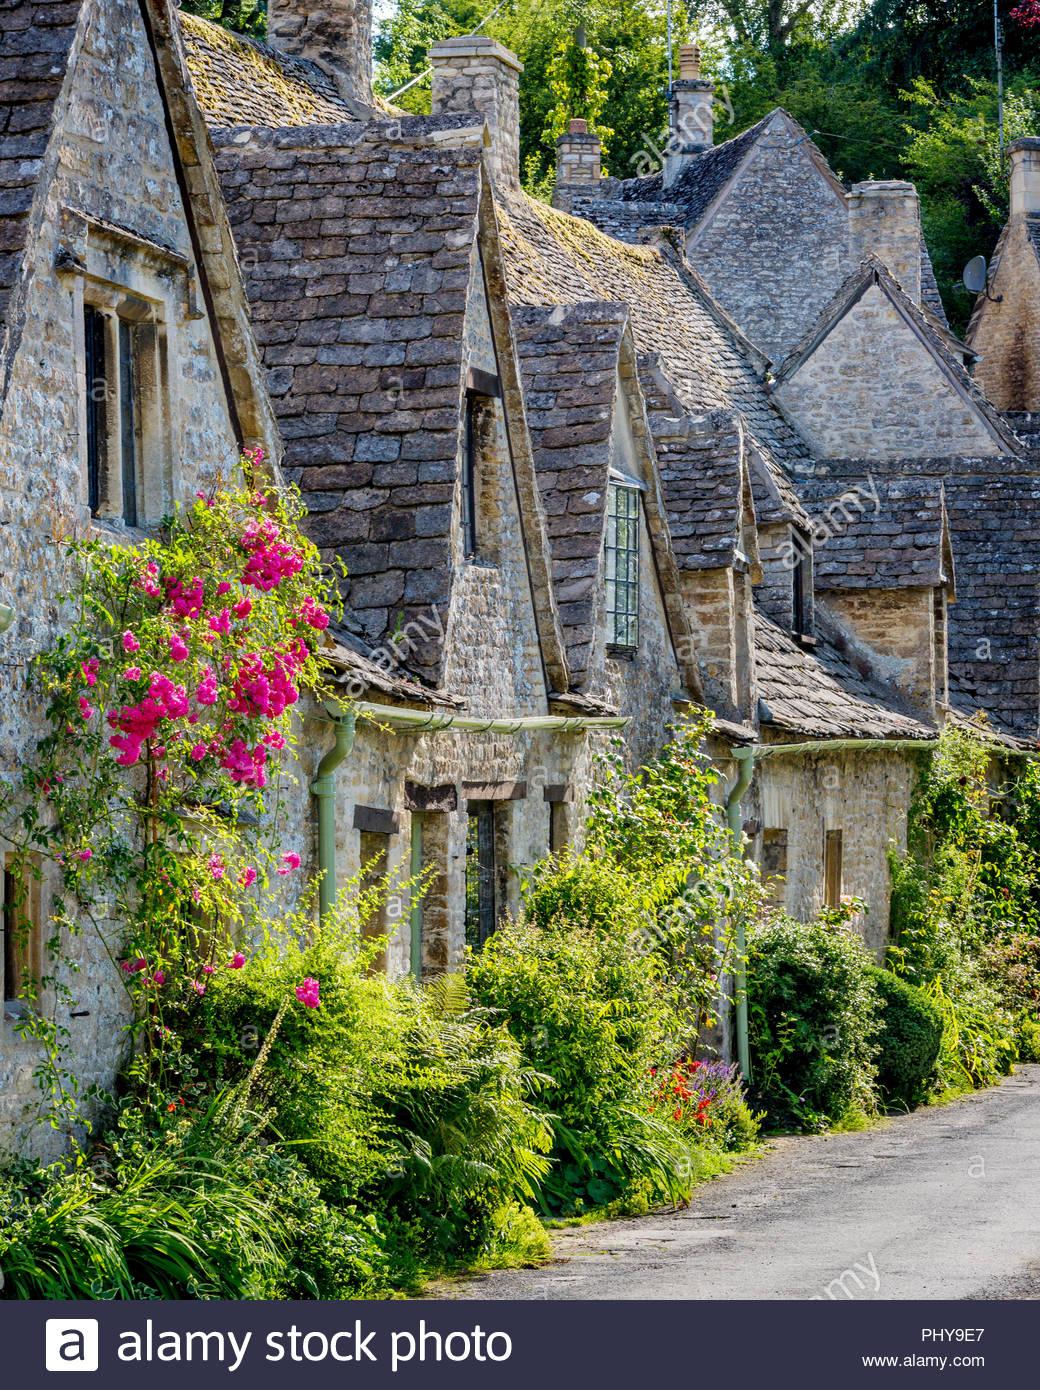 Arlington Row - homes built for the local weavers, Bibury, Glocestershire, England - Stock Image